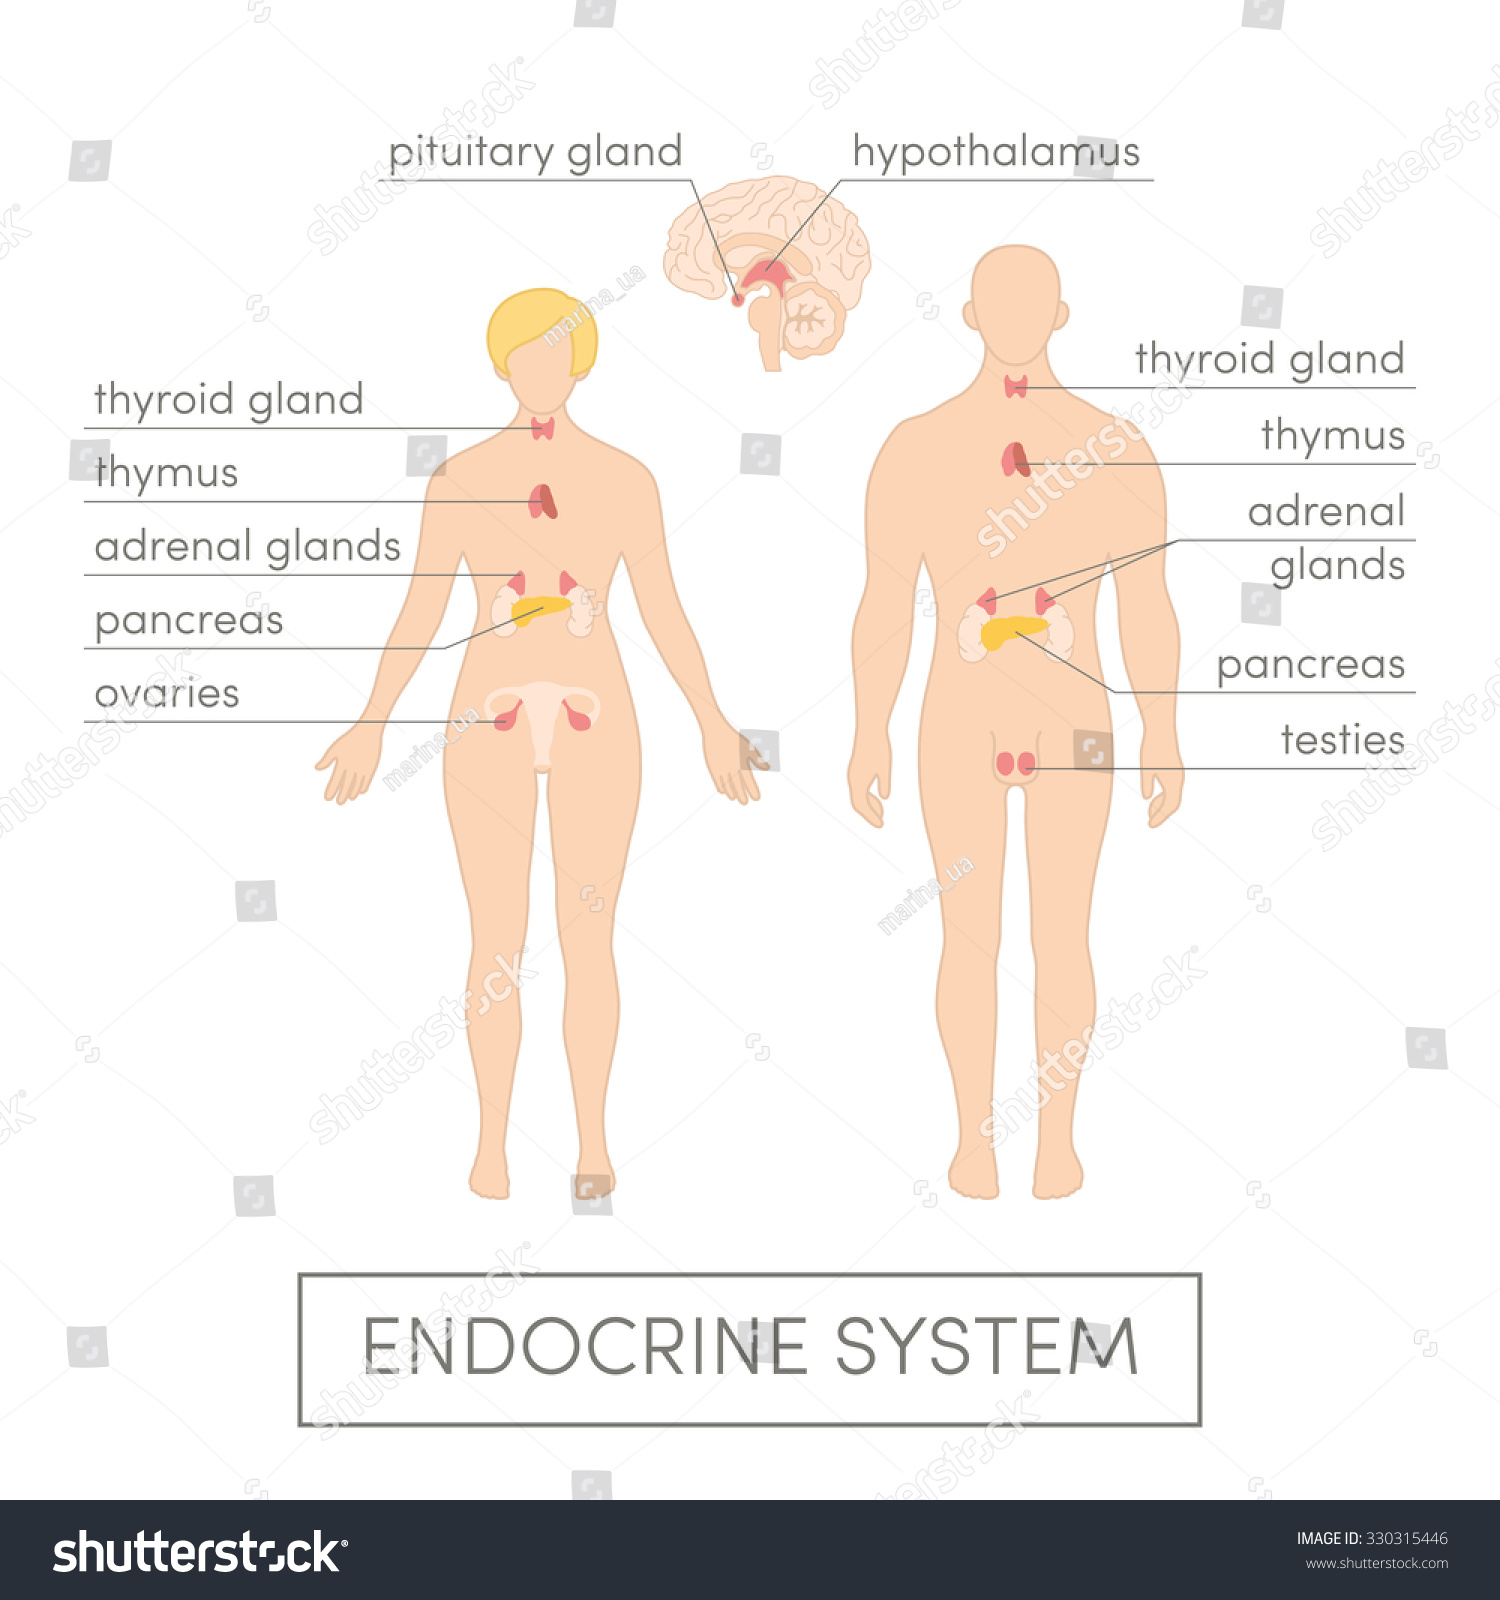 Endocrine System Human Cartoon Vector Illustration Stock Vector